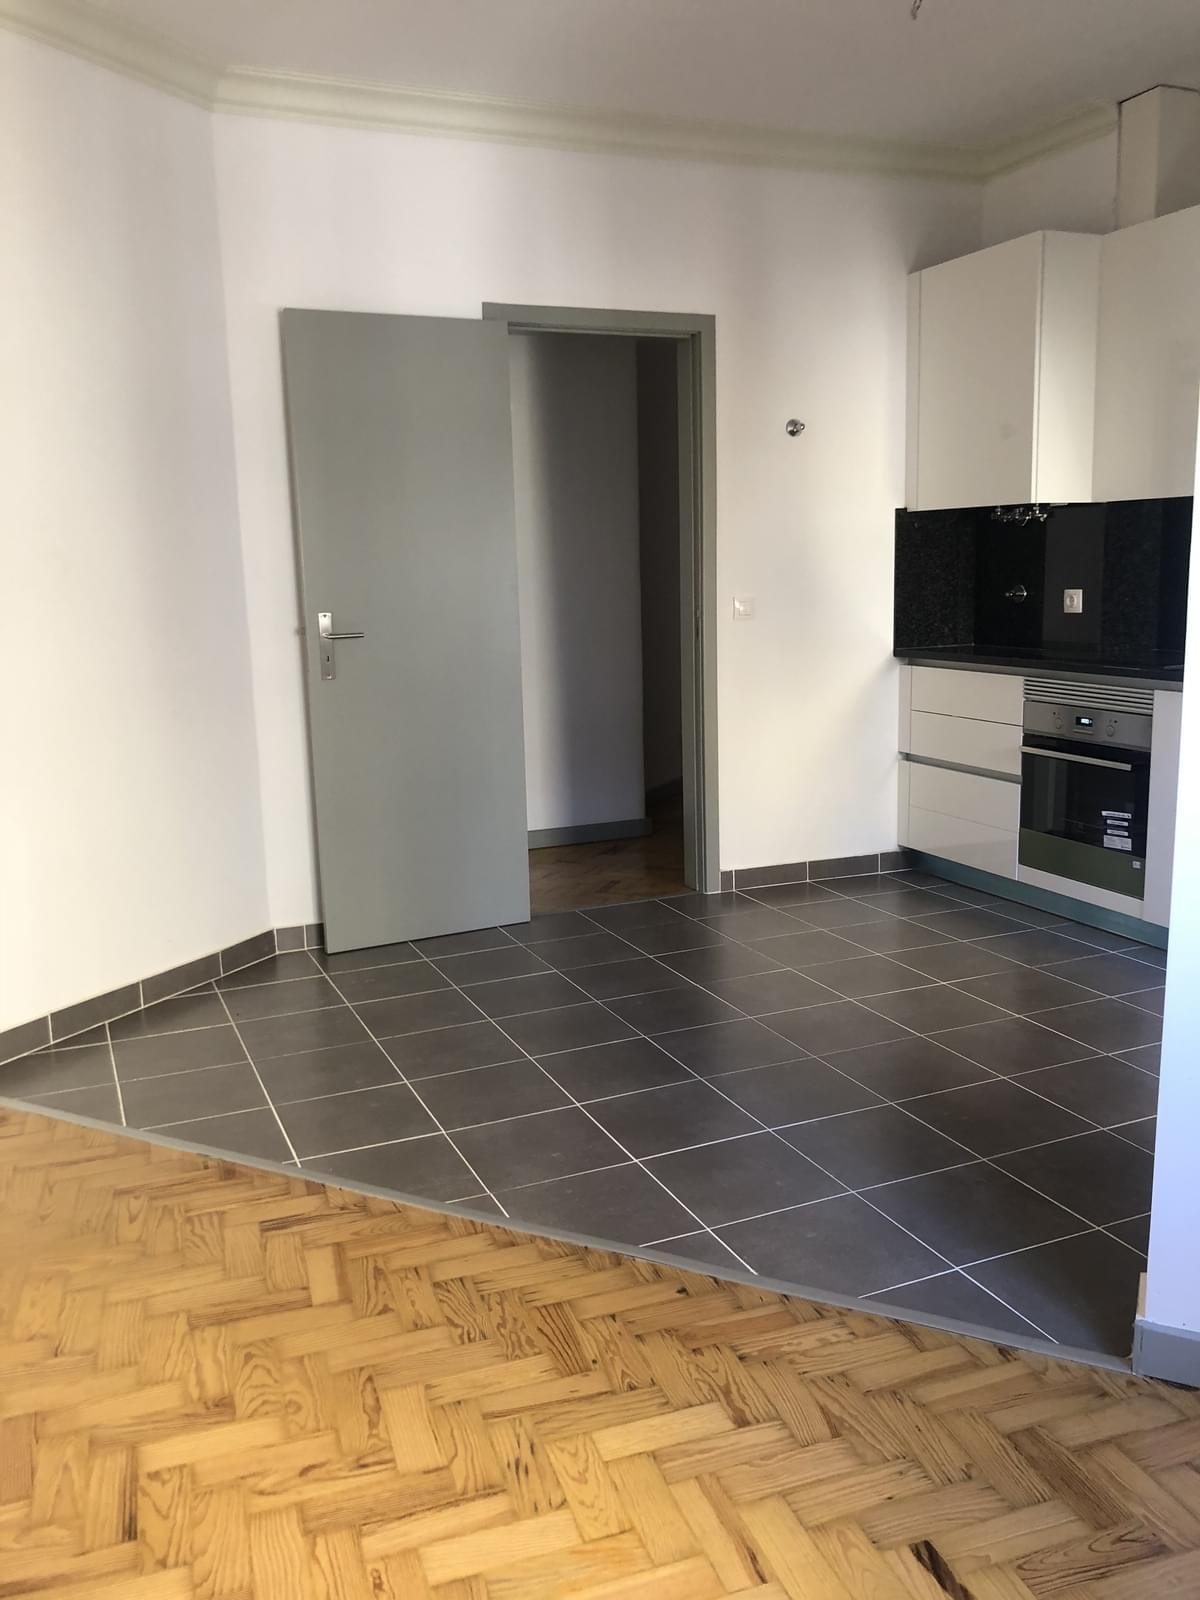 pf17234-apartamento-t3-lisboa-2e4772db-d794-4b61-b97e-06411316462e